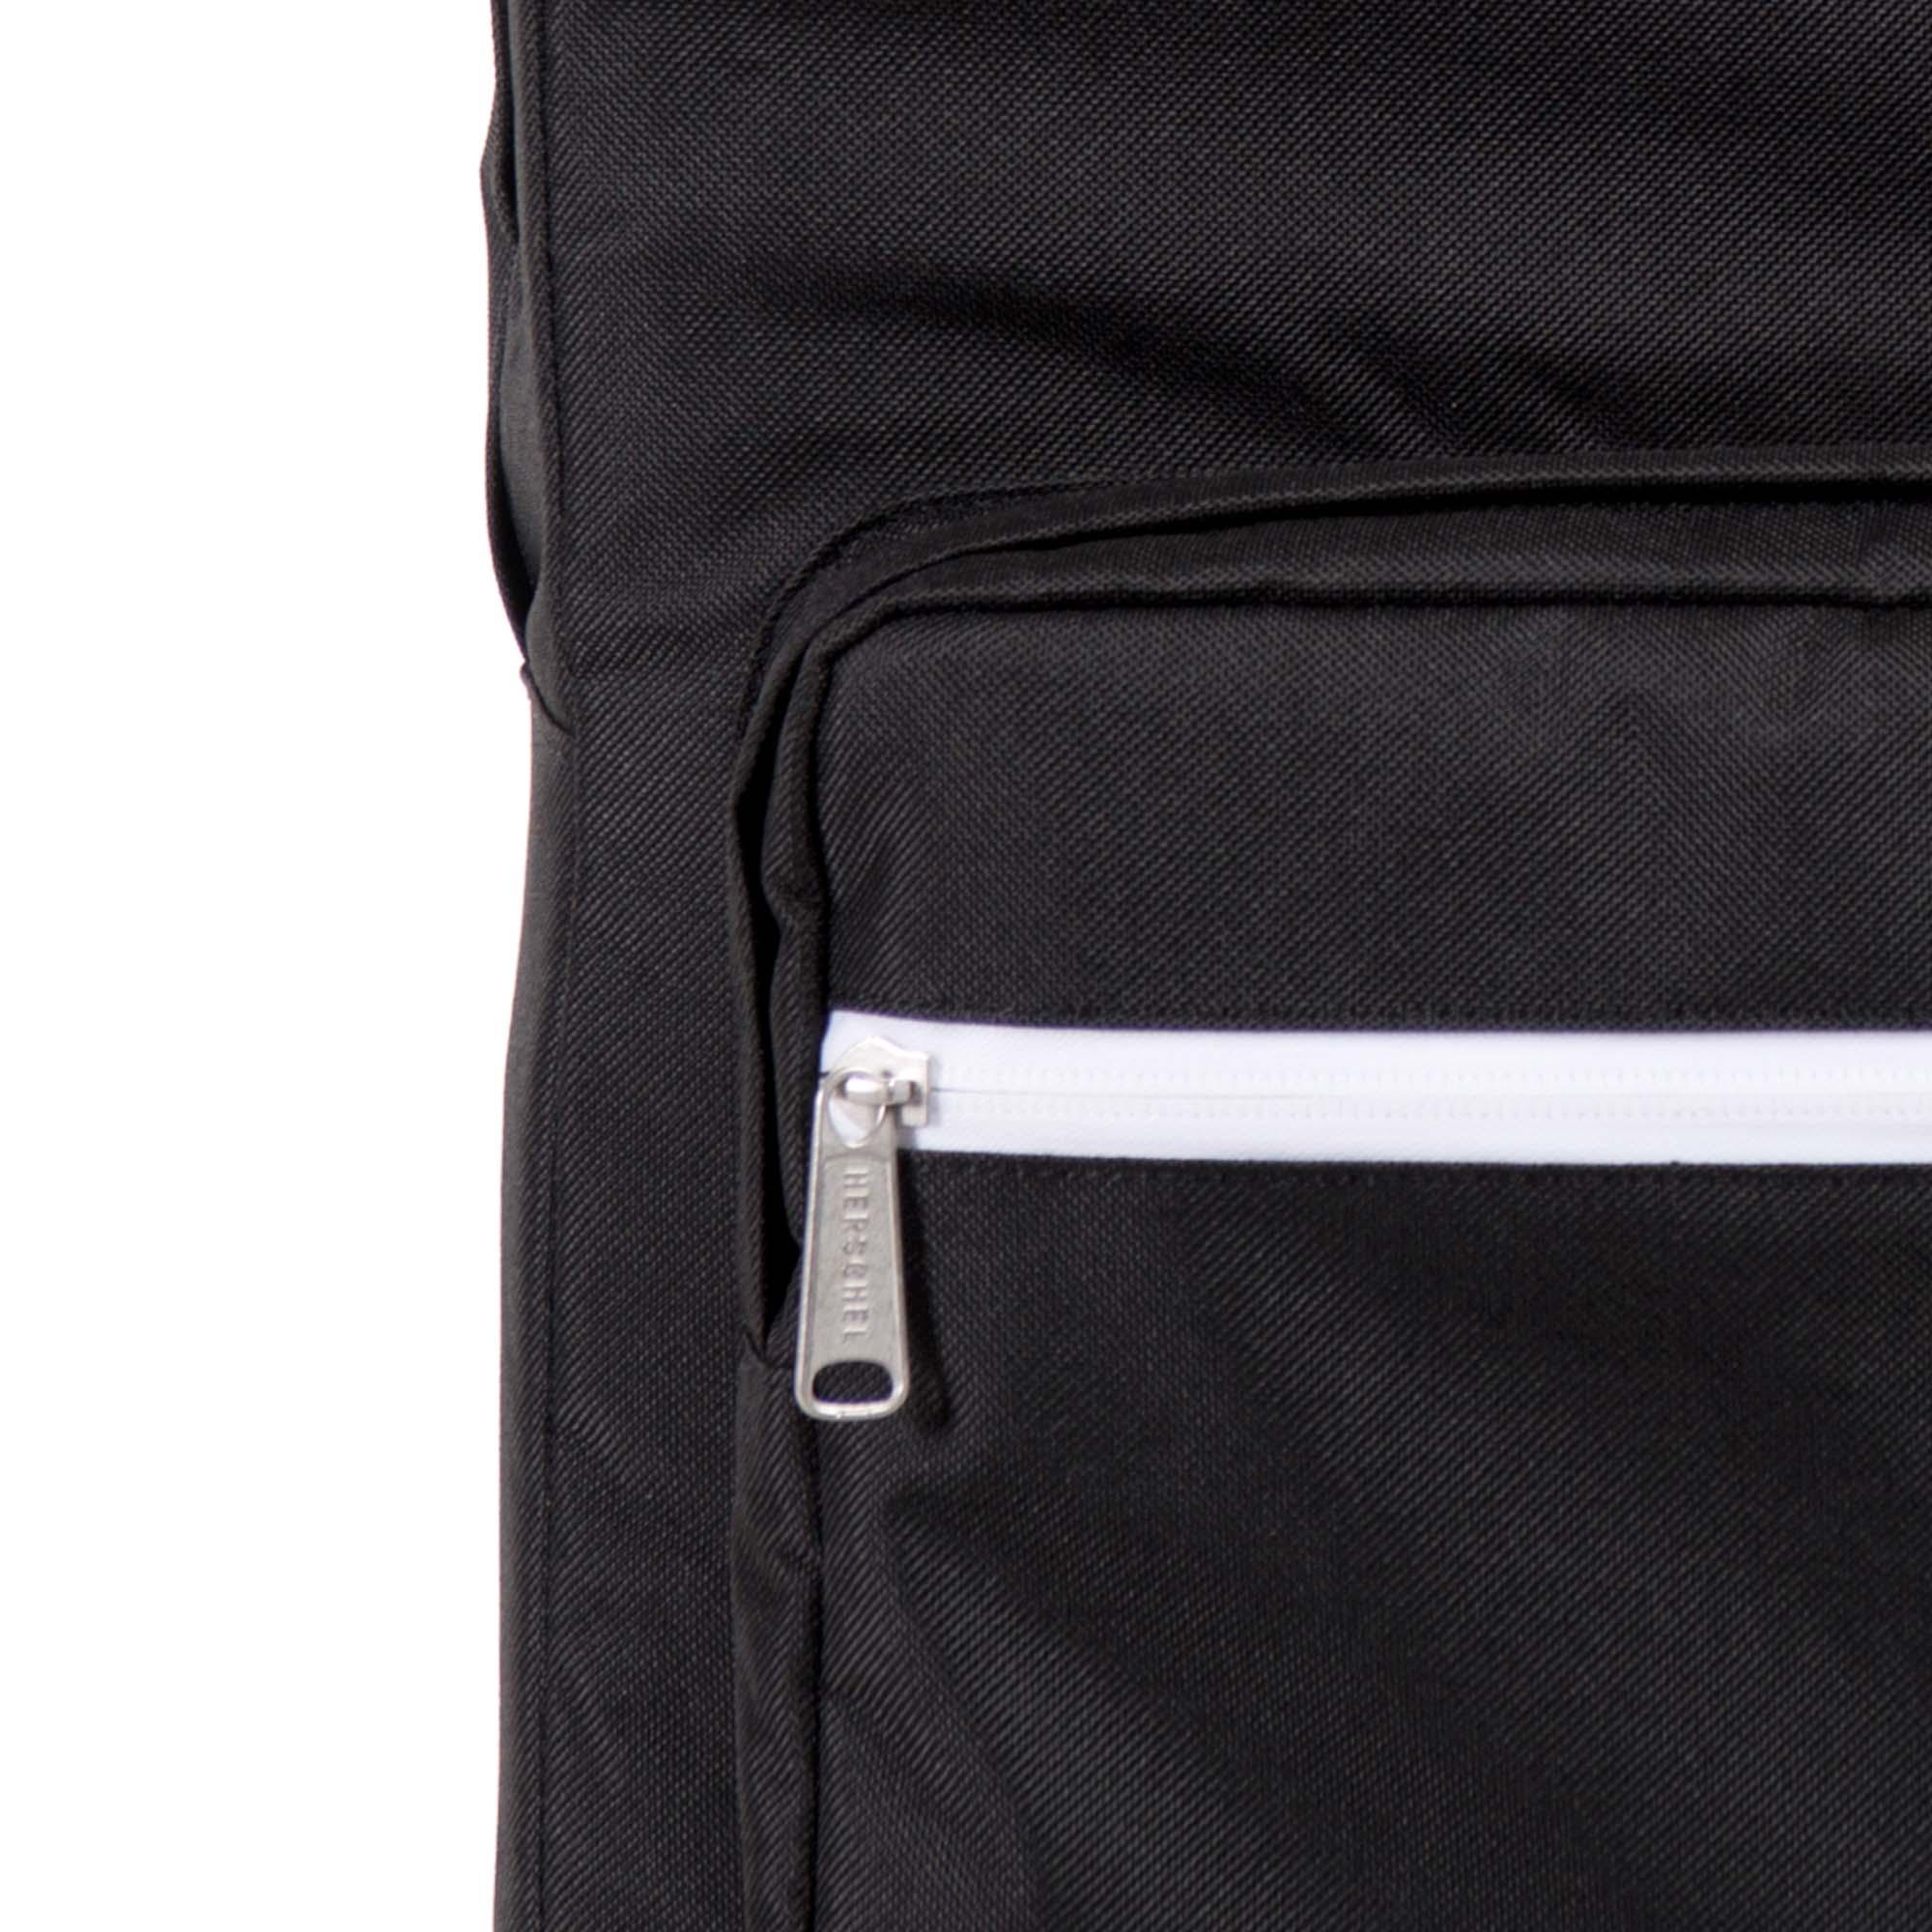 Herschel - Backpacks - Pop Quiz - Black - Overload 67db739a36c9e